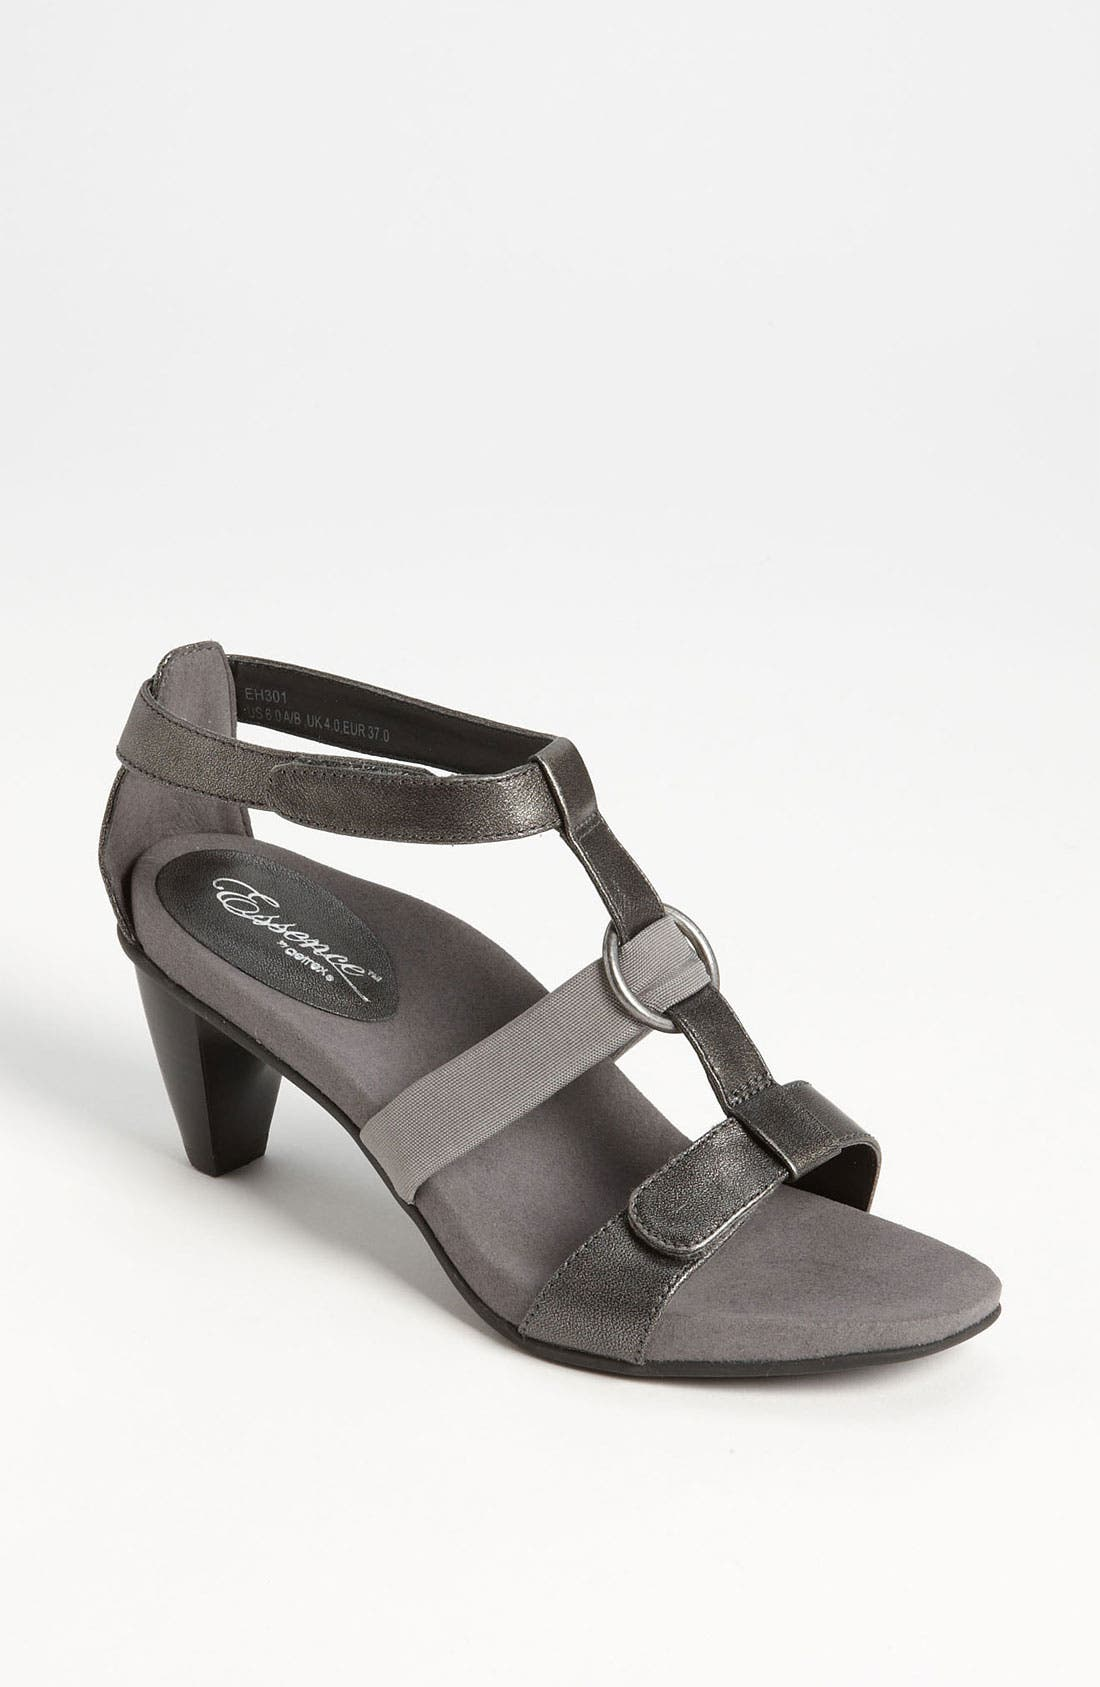 Main Image - Aetrex 'Sofia' Sandal